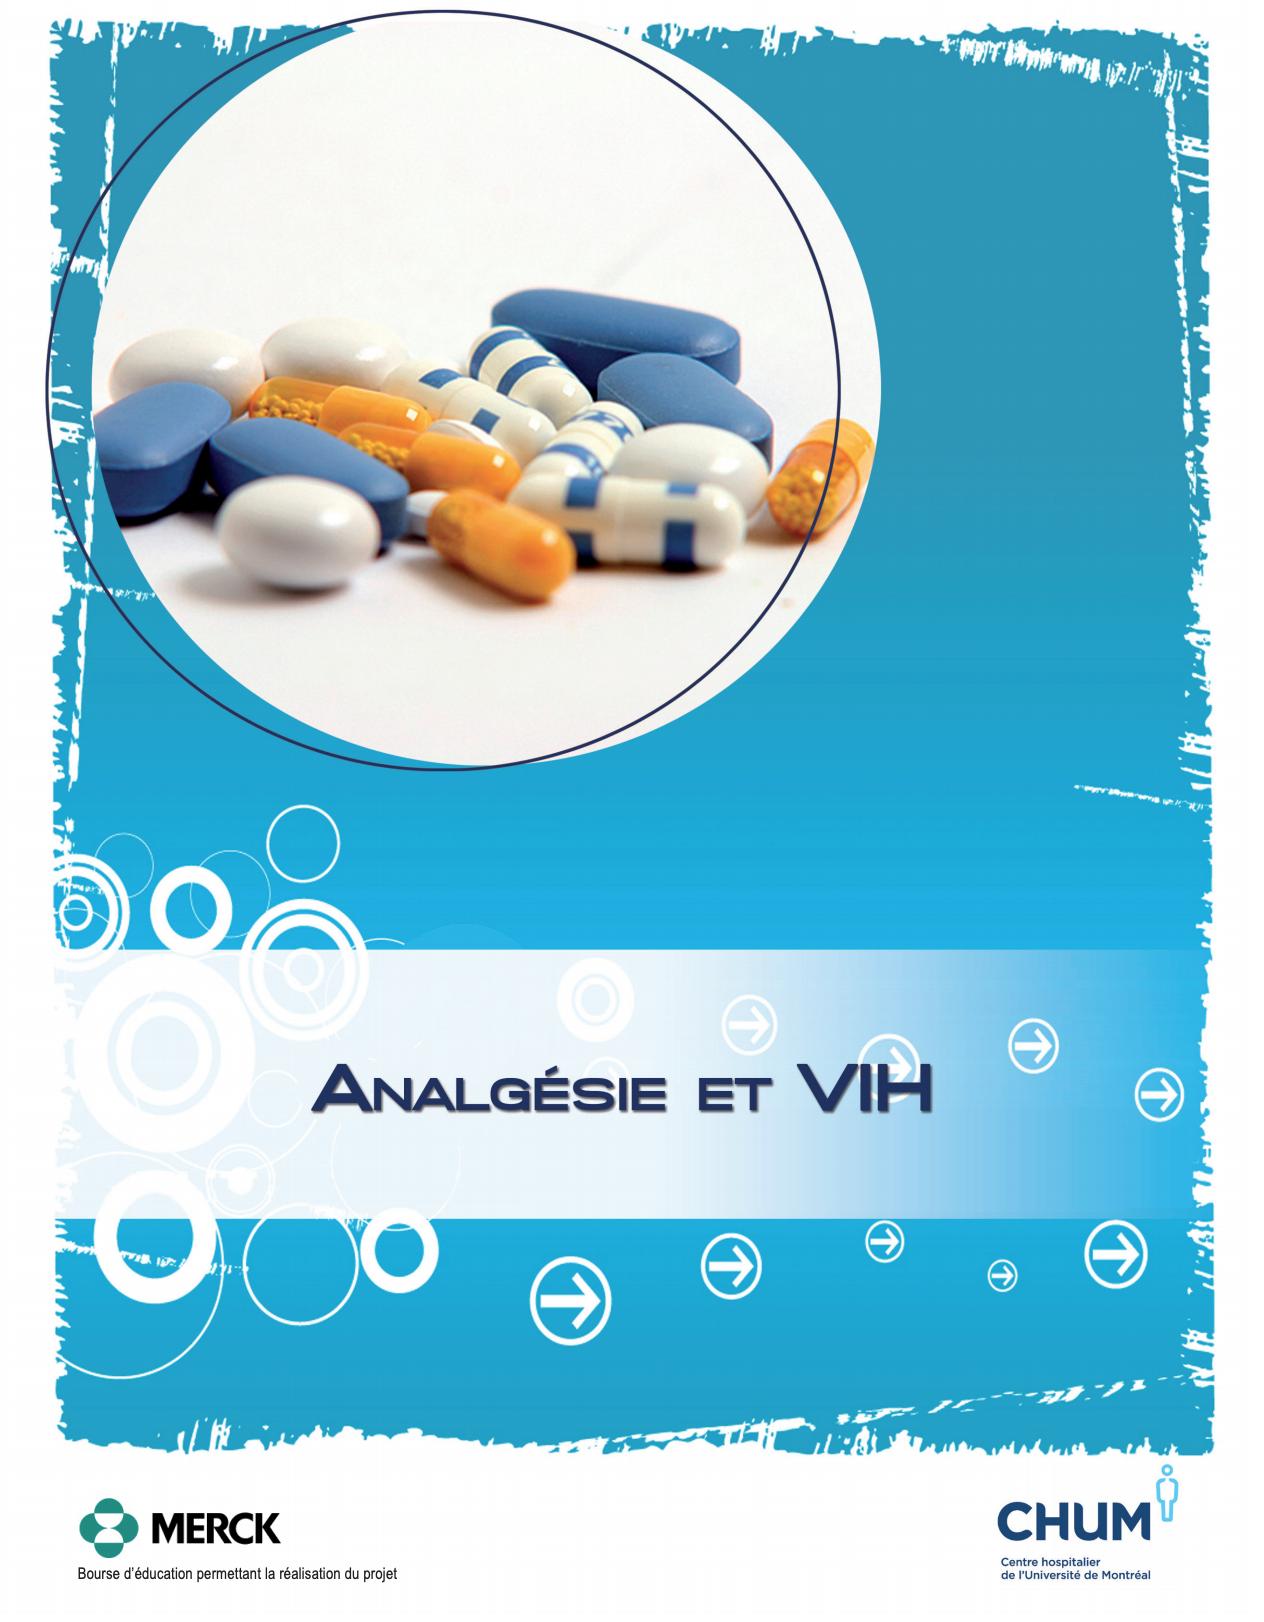 Analgésie et VIH